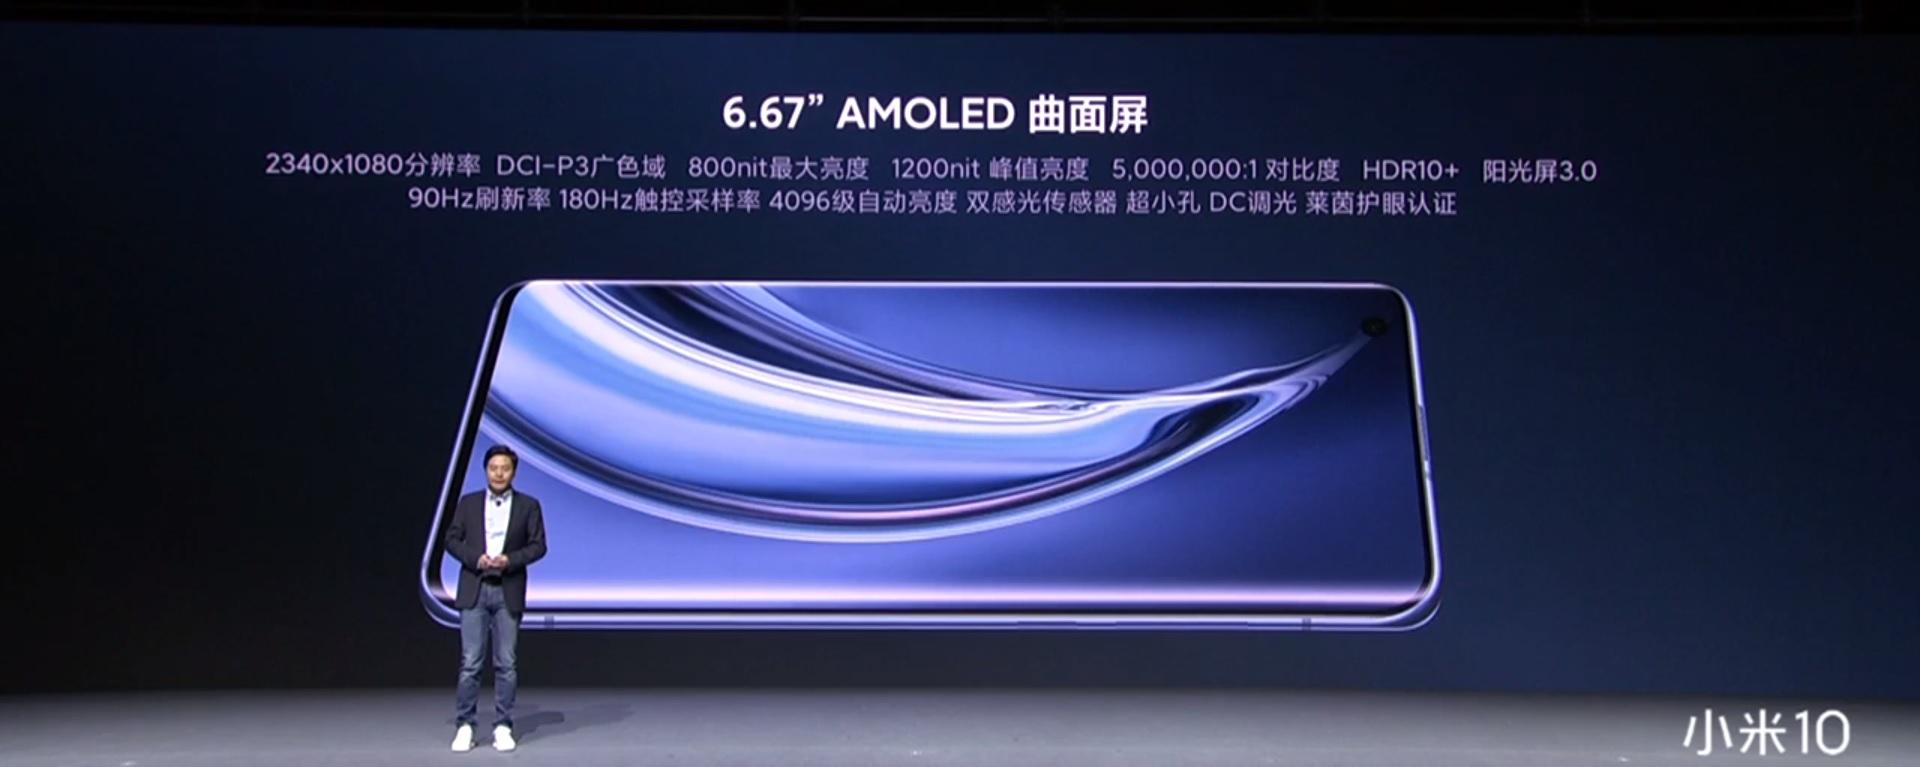 Xiaomi Mi 10 Pro ekran